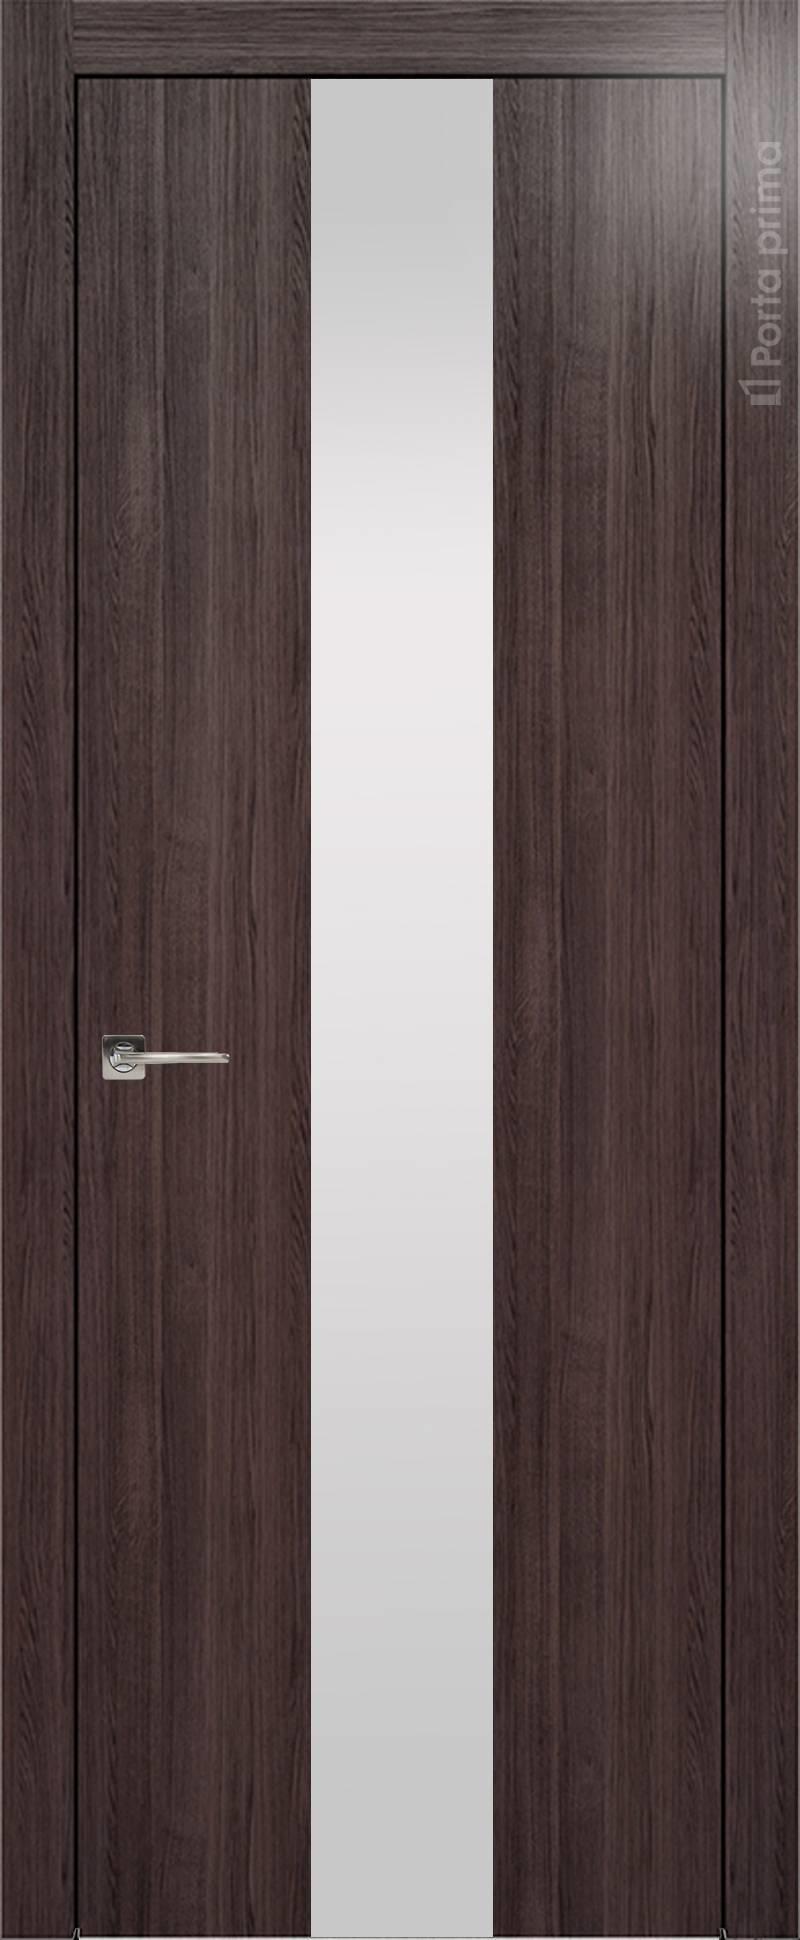 Tivoli Ж-1 цвет - Венге Нуар Со стеклом (ДО)